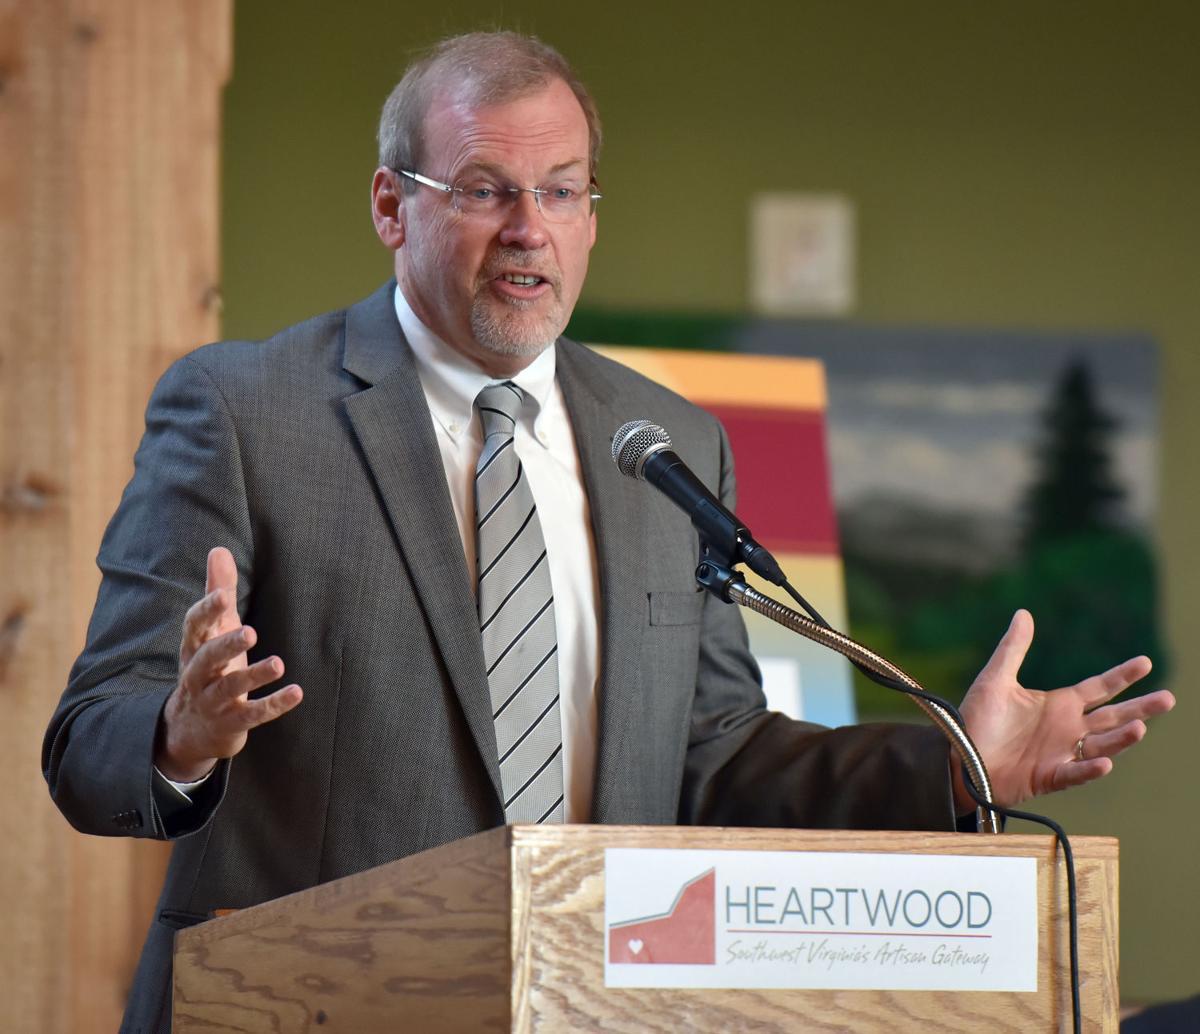 Southwest Virginia Creative Economy Conference 2015